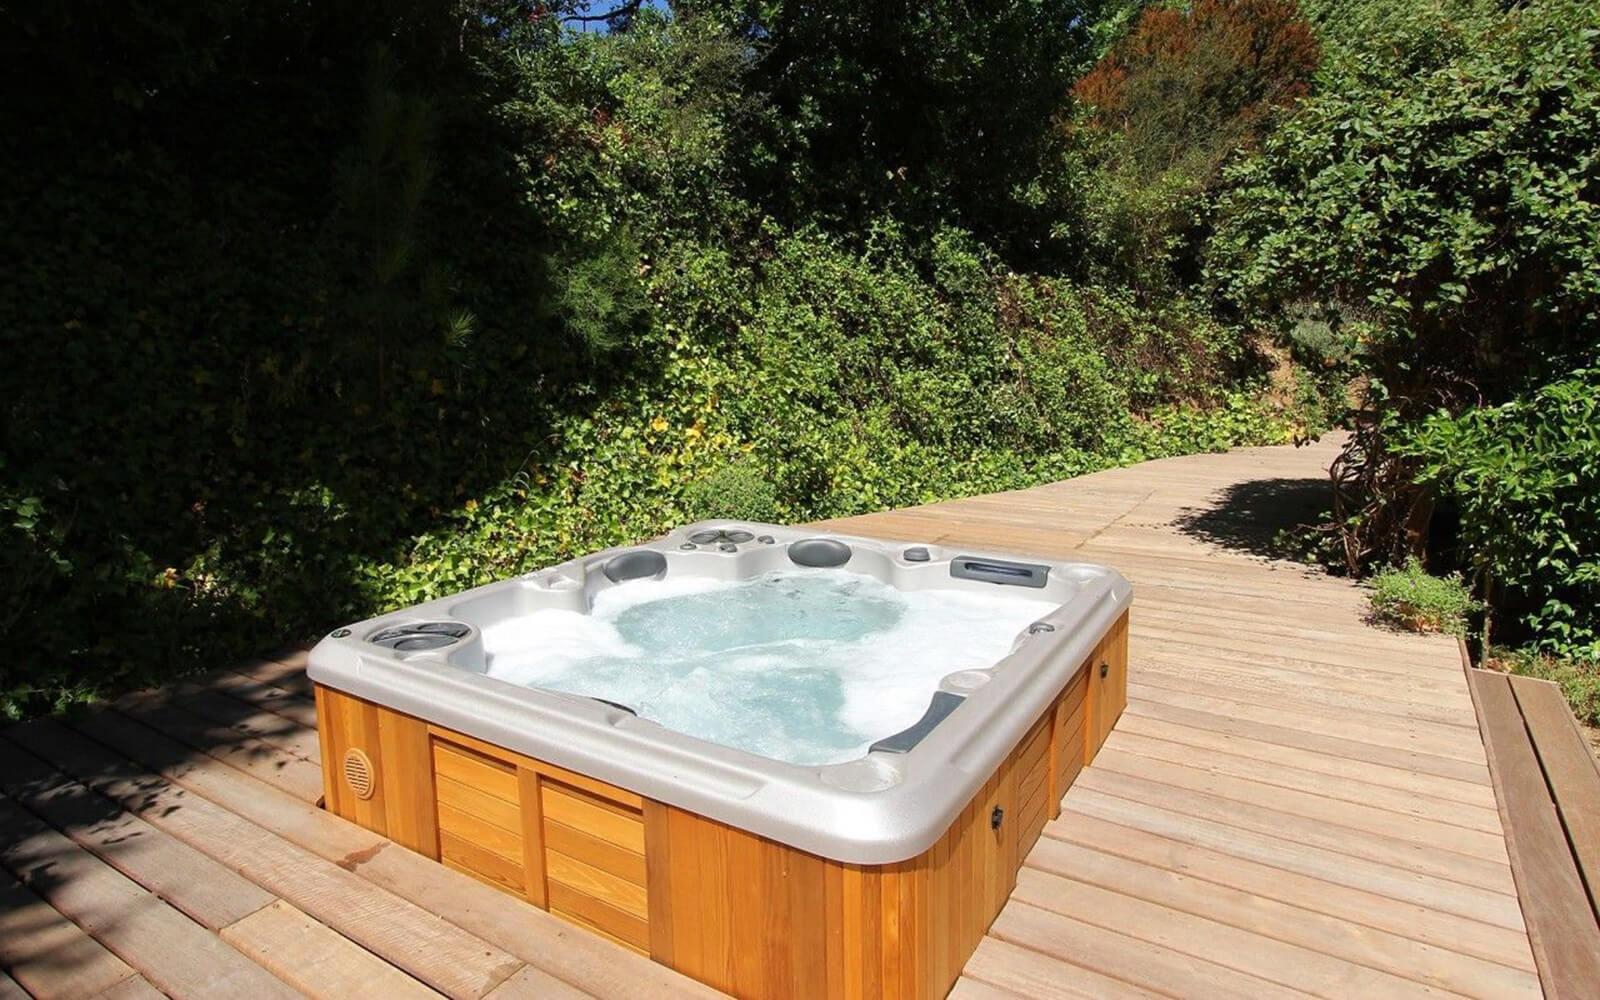 Hydropool 670 Self-Cleaning Hot Tub